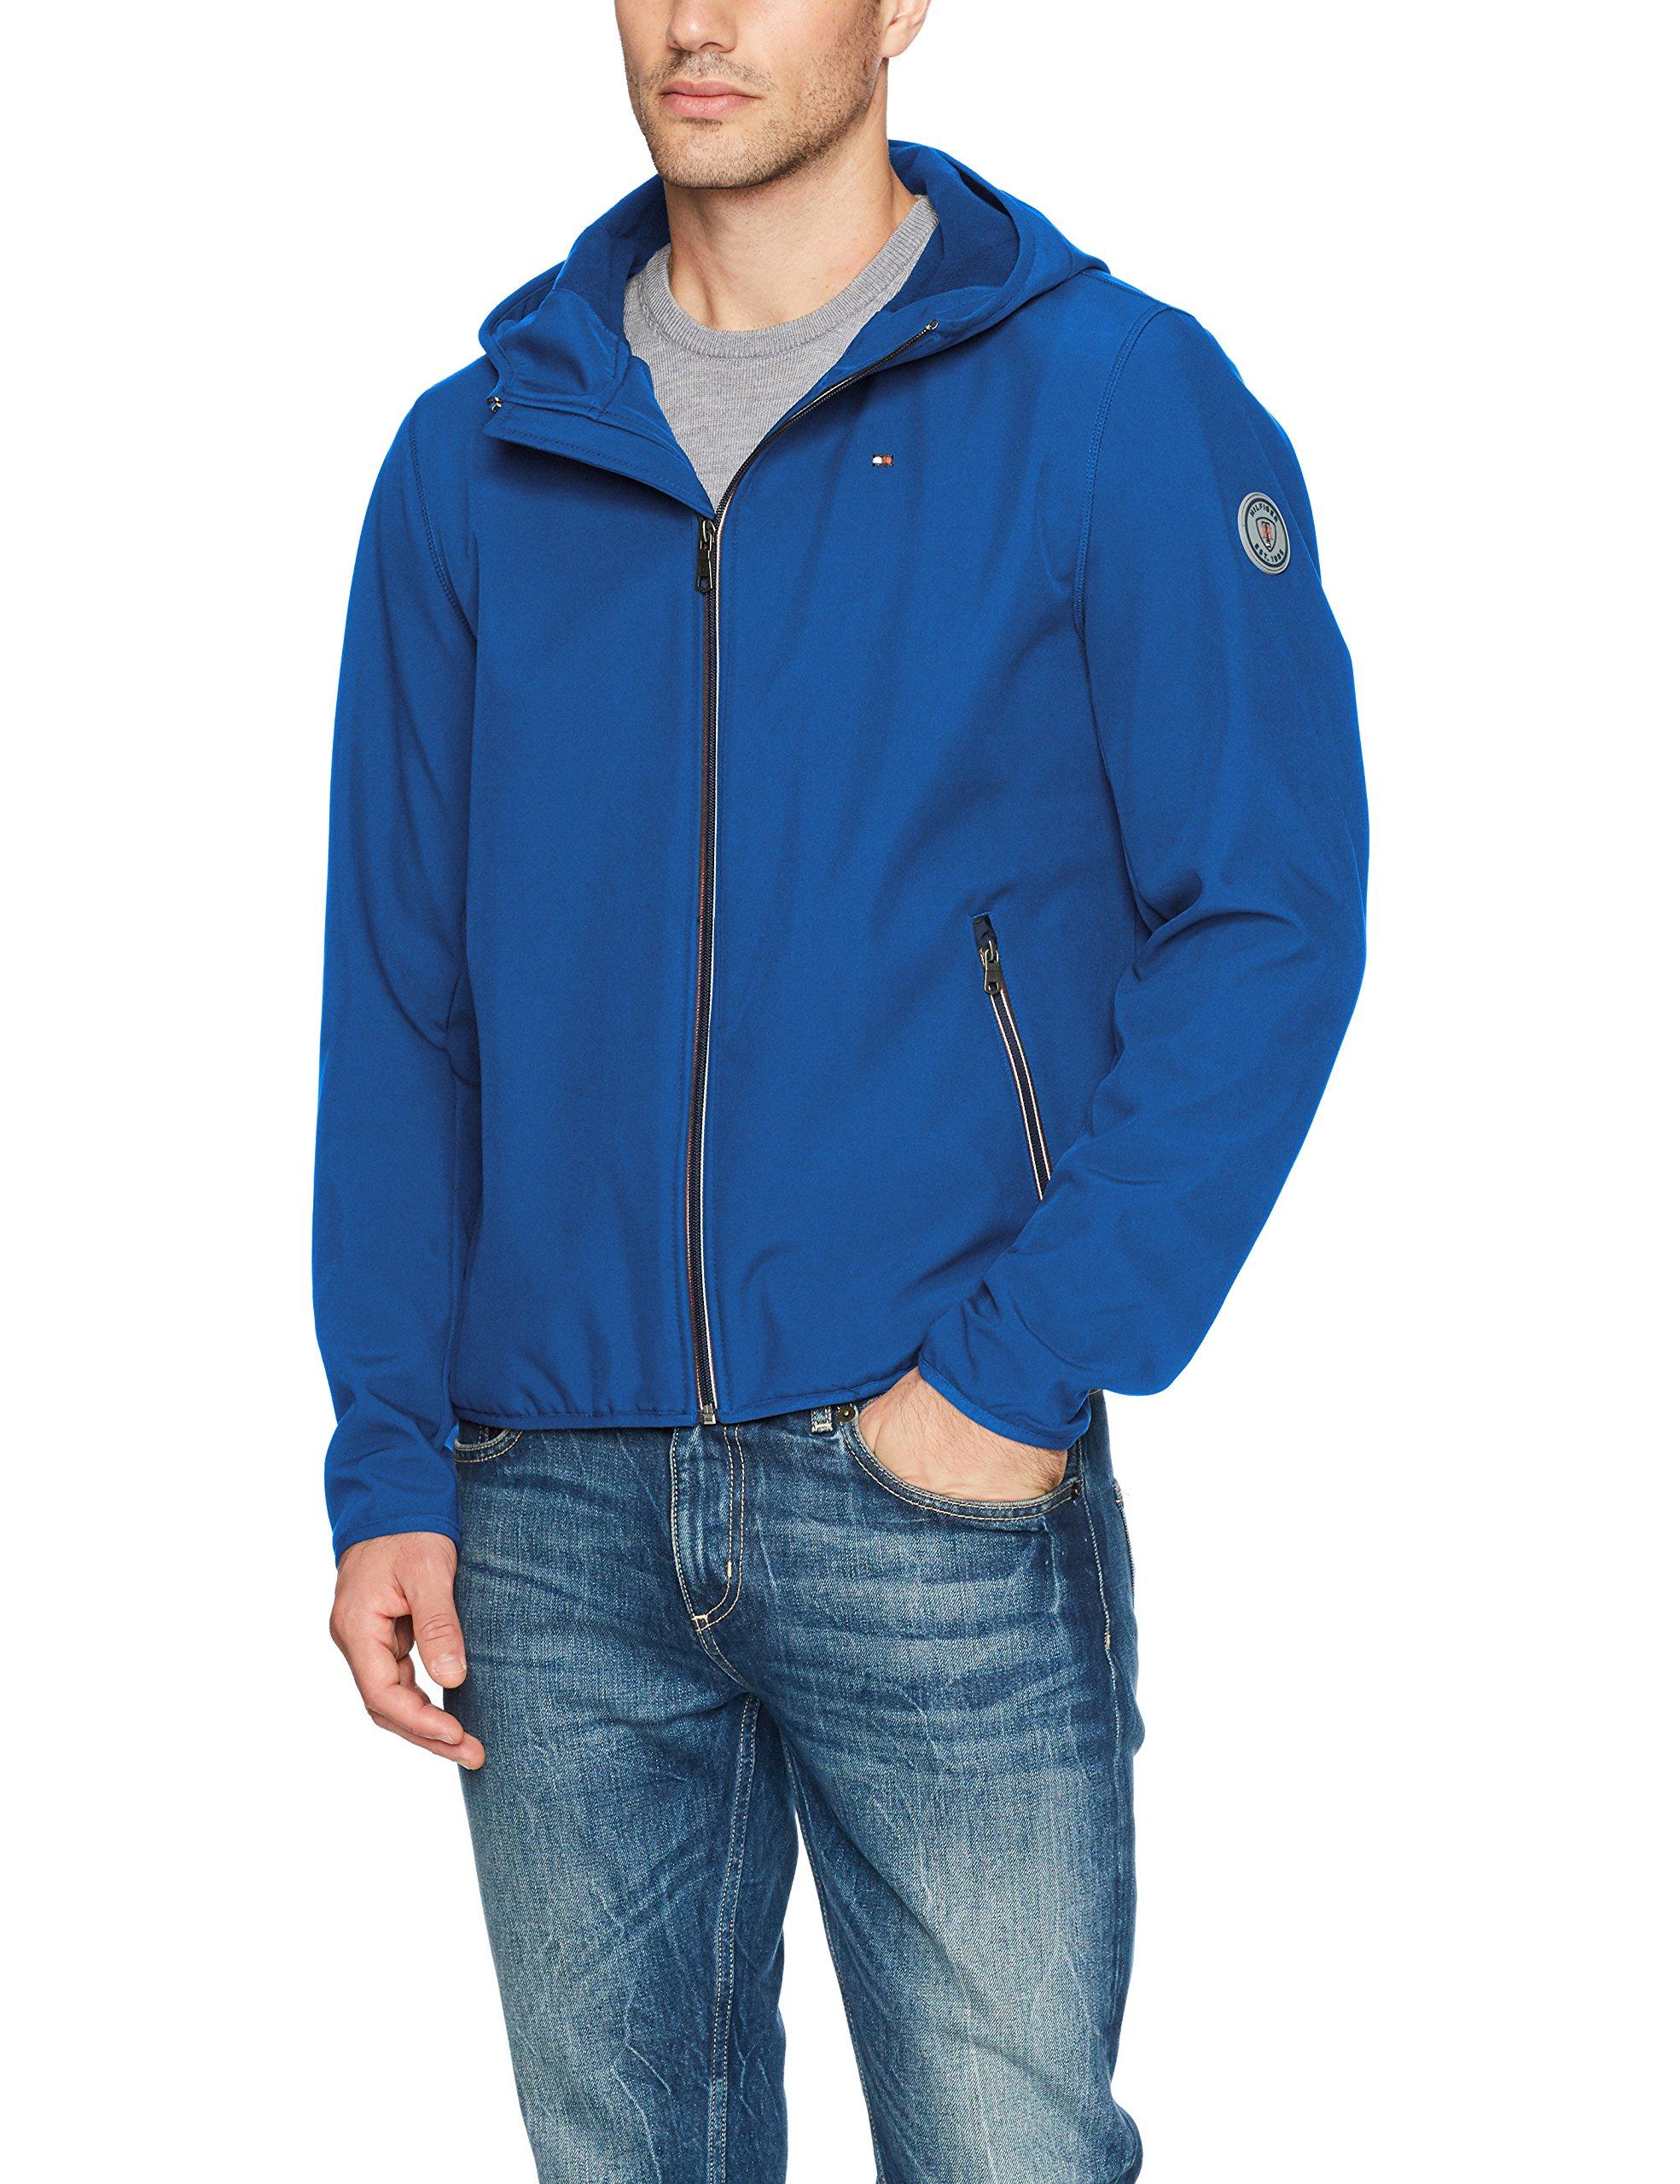 Tommy Hilfiger Men's Hooded Performance Soft Shell Jacket, royal blue, Large by Tommy Hilfiger